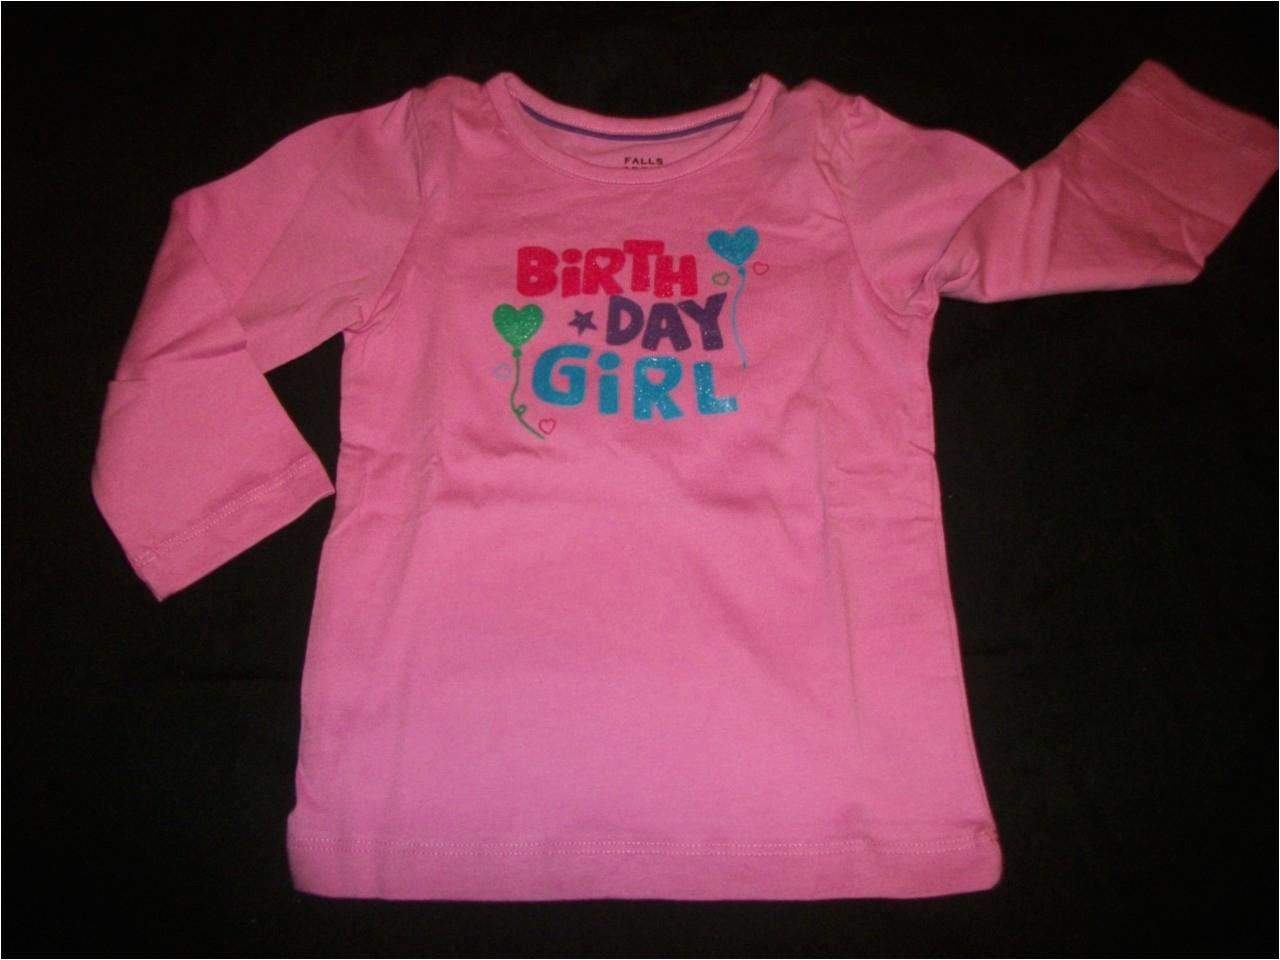 Birthday Girl Shirt 4t New Girls Size 3t 4t 5t Birthday Girl Shirt Ebay